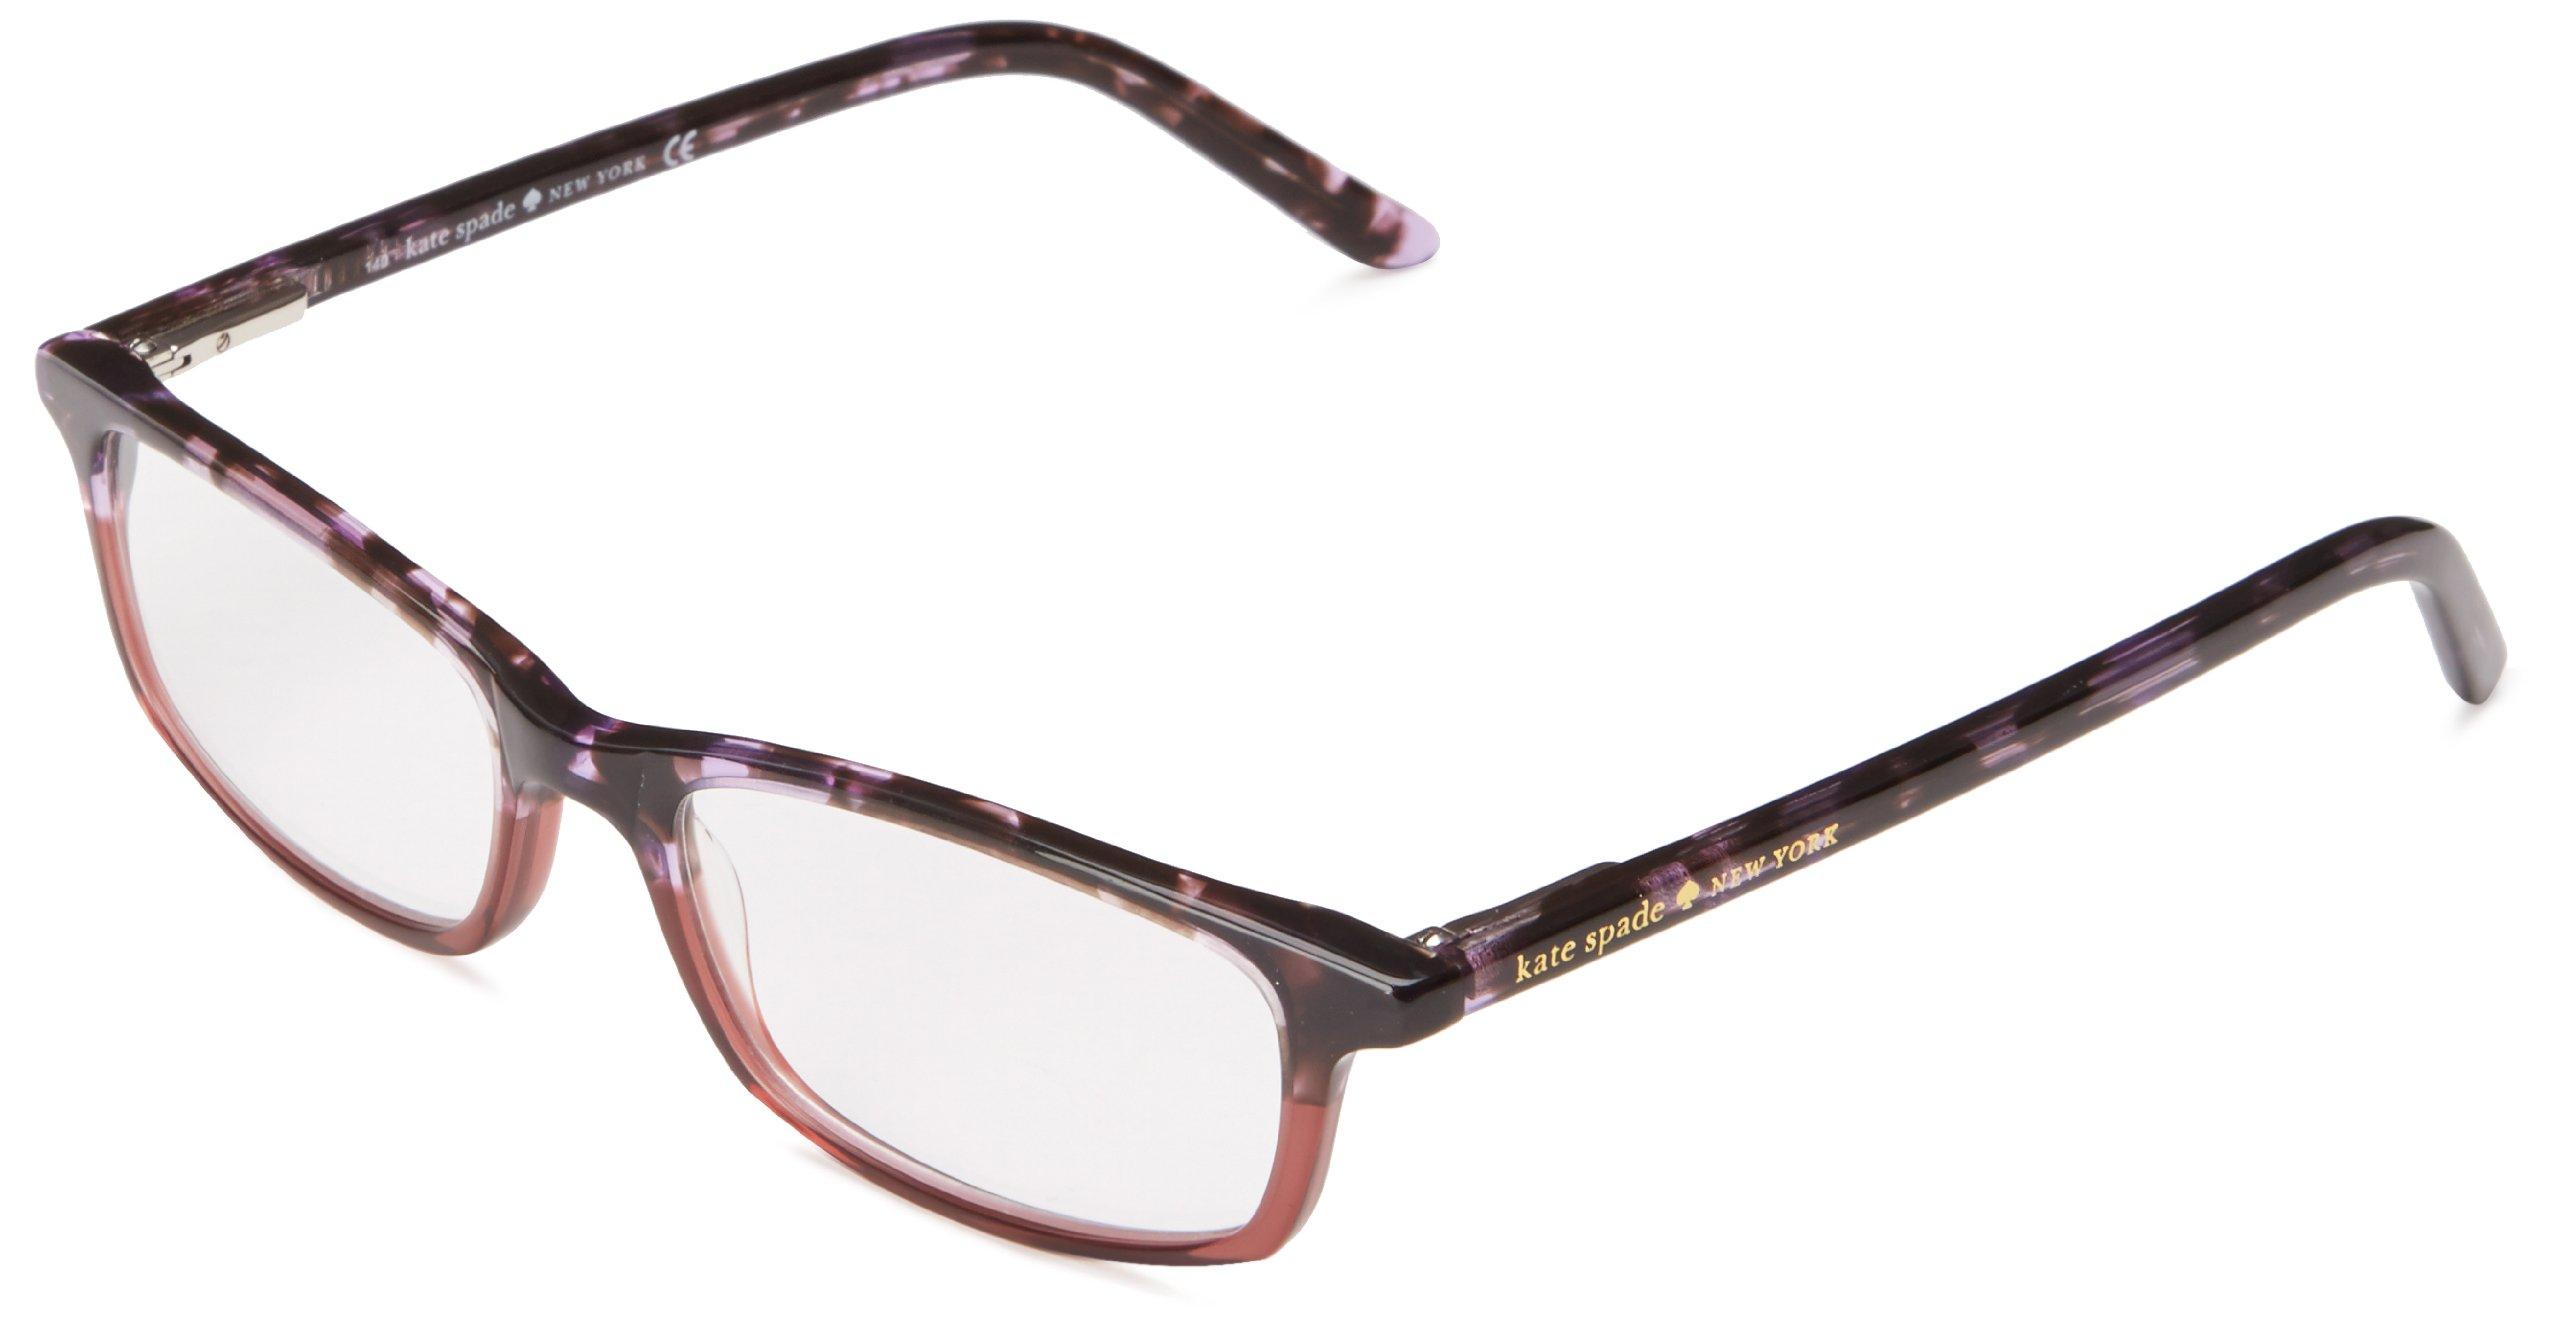 Kate Spade Jodie Rectangular Reading Glasses,Purple Tortoise 15,50 mm